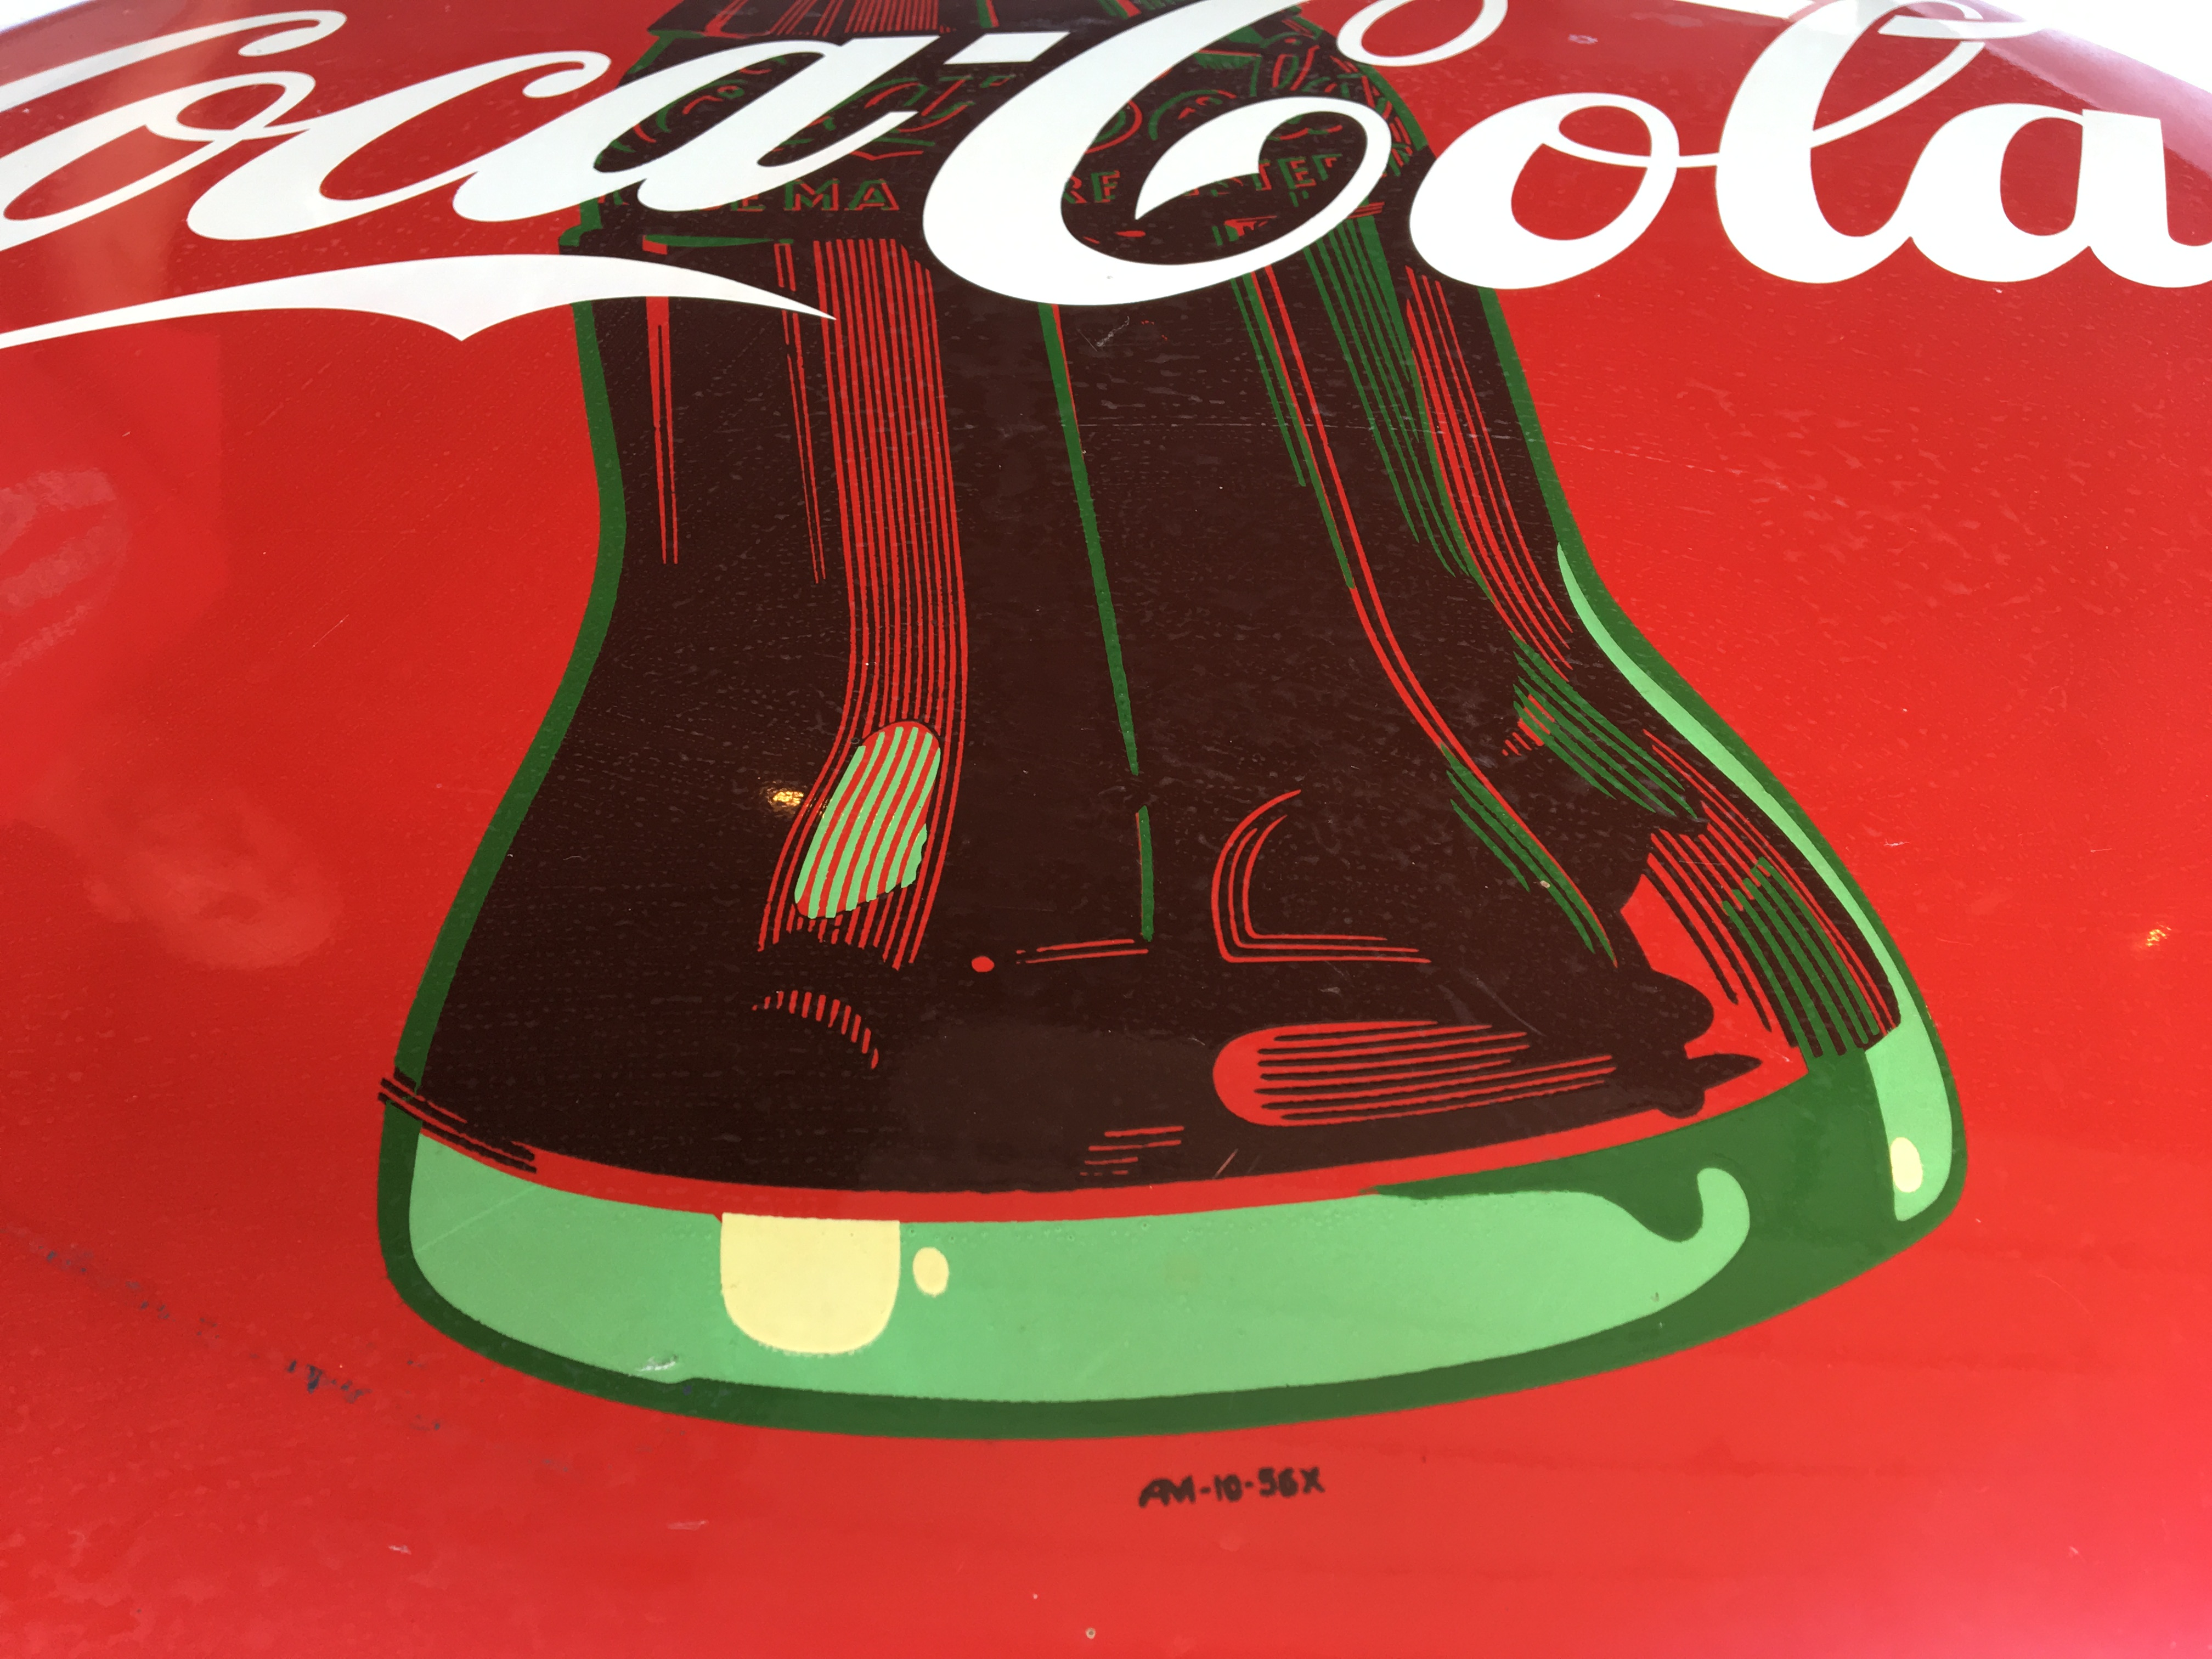 "Lot 19 - Coca-Cola 36"" Round Sign, AM-10-56X"